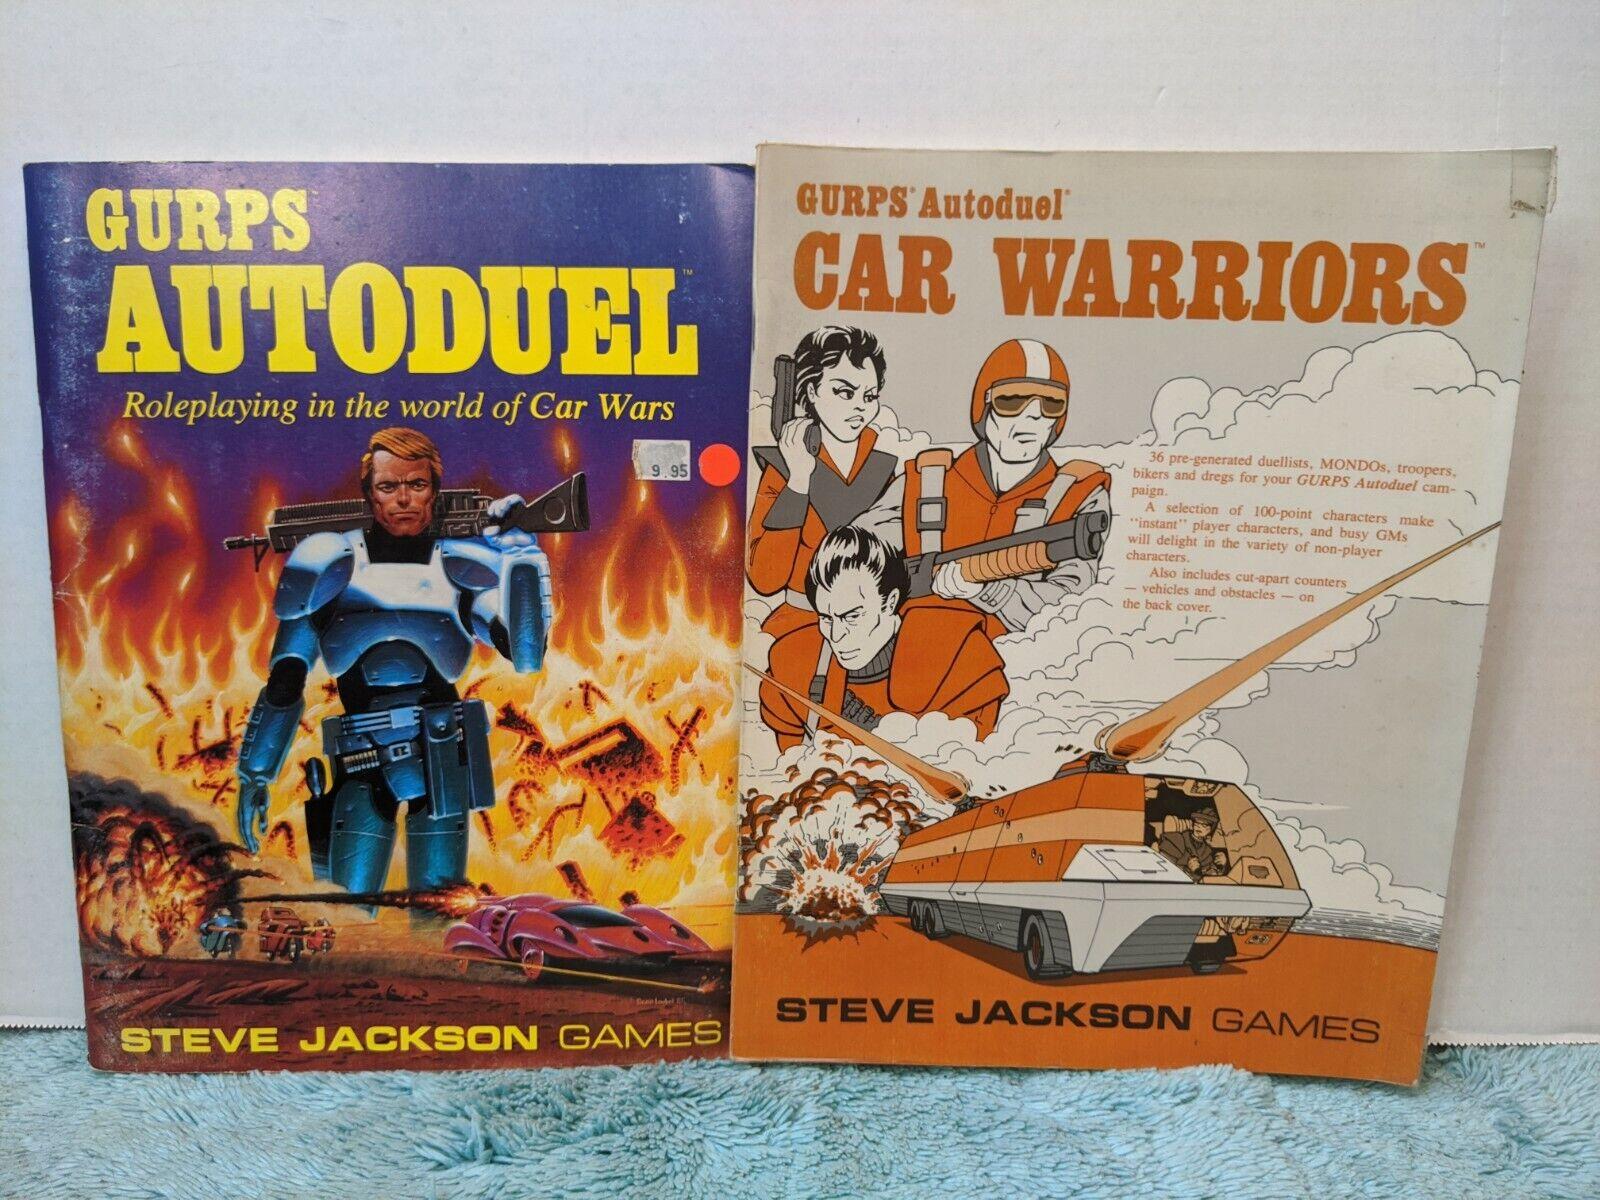 GURPS Autoduel 1986 and Car Warriors 1987 bundle.